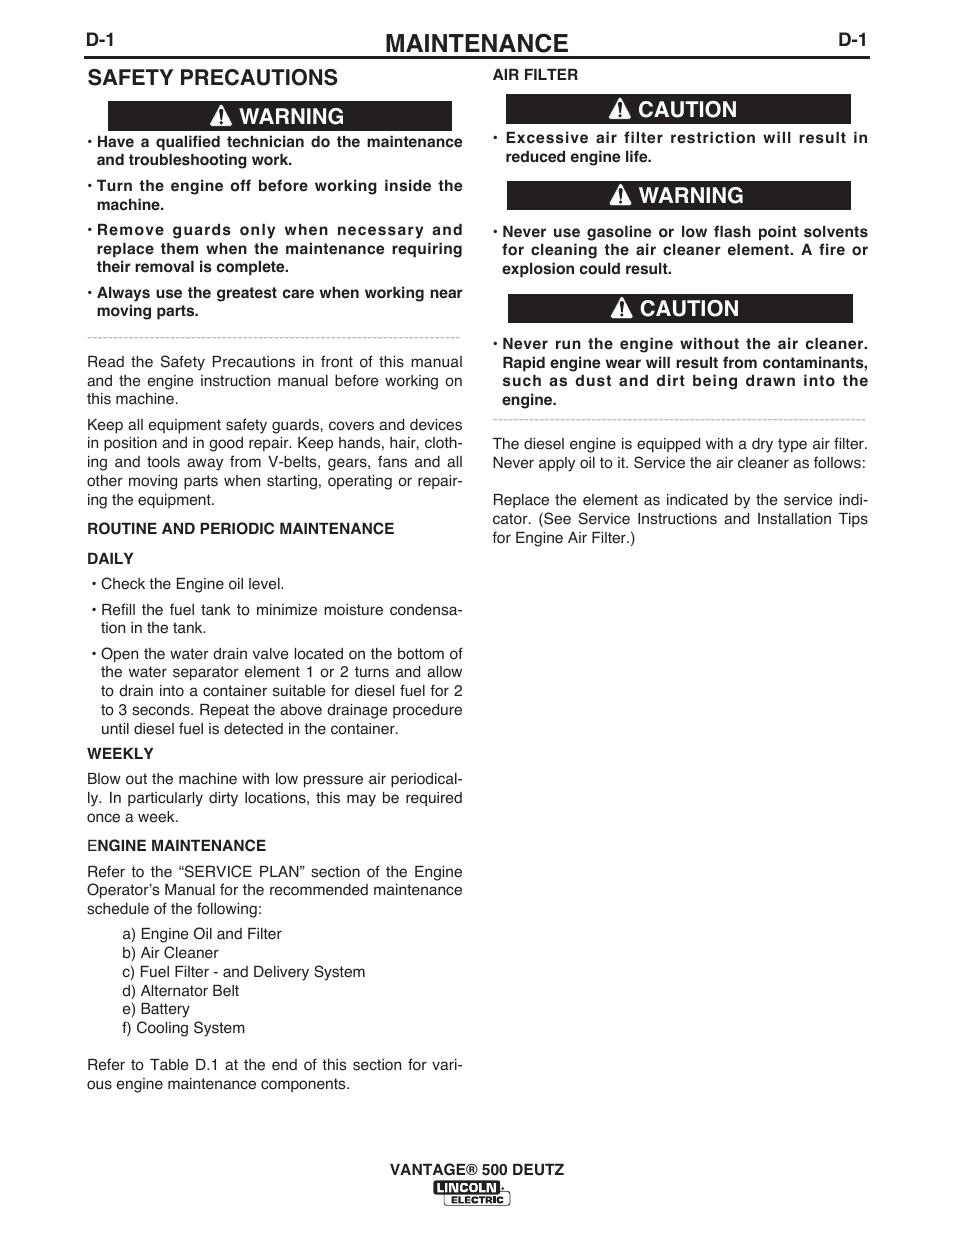 Maintenance, Safety precautions, Warning | Caution, Caution warning |  Lincoln Electric IM954 VANTAGE